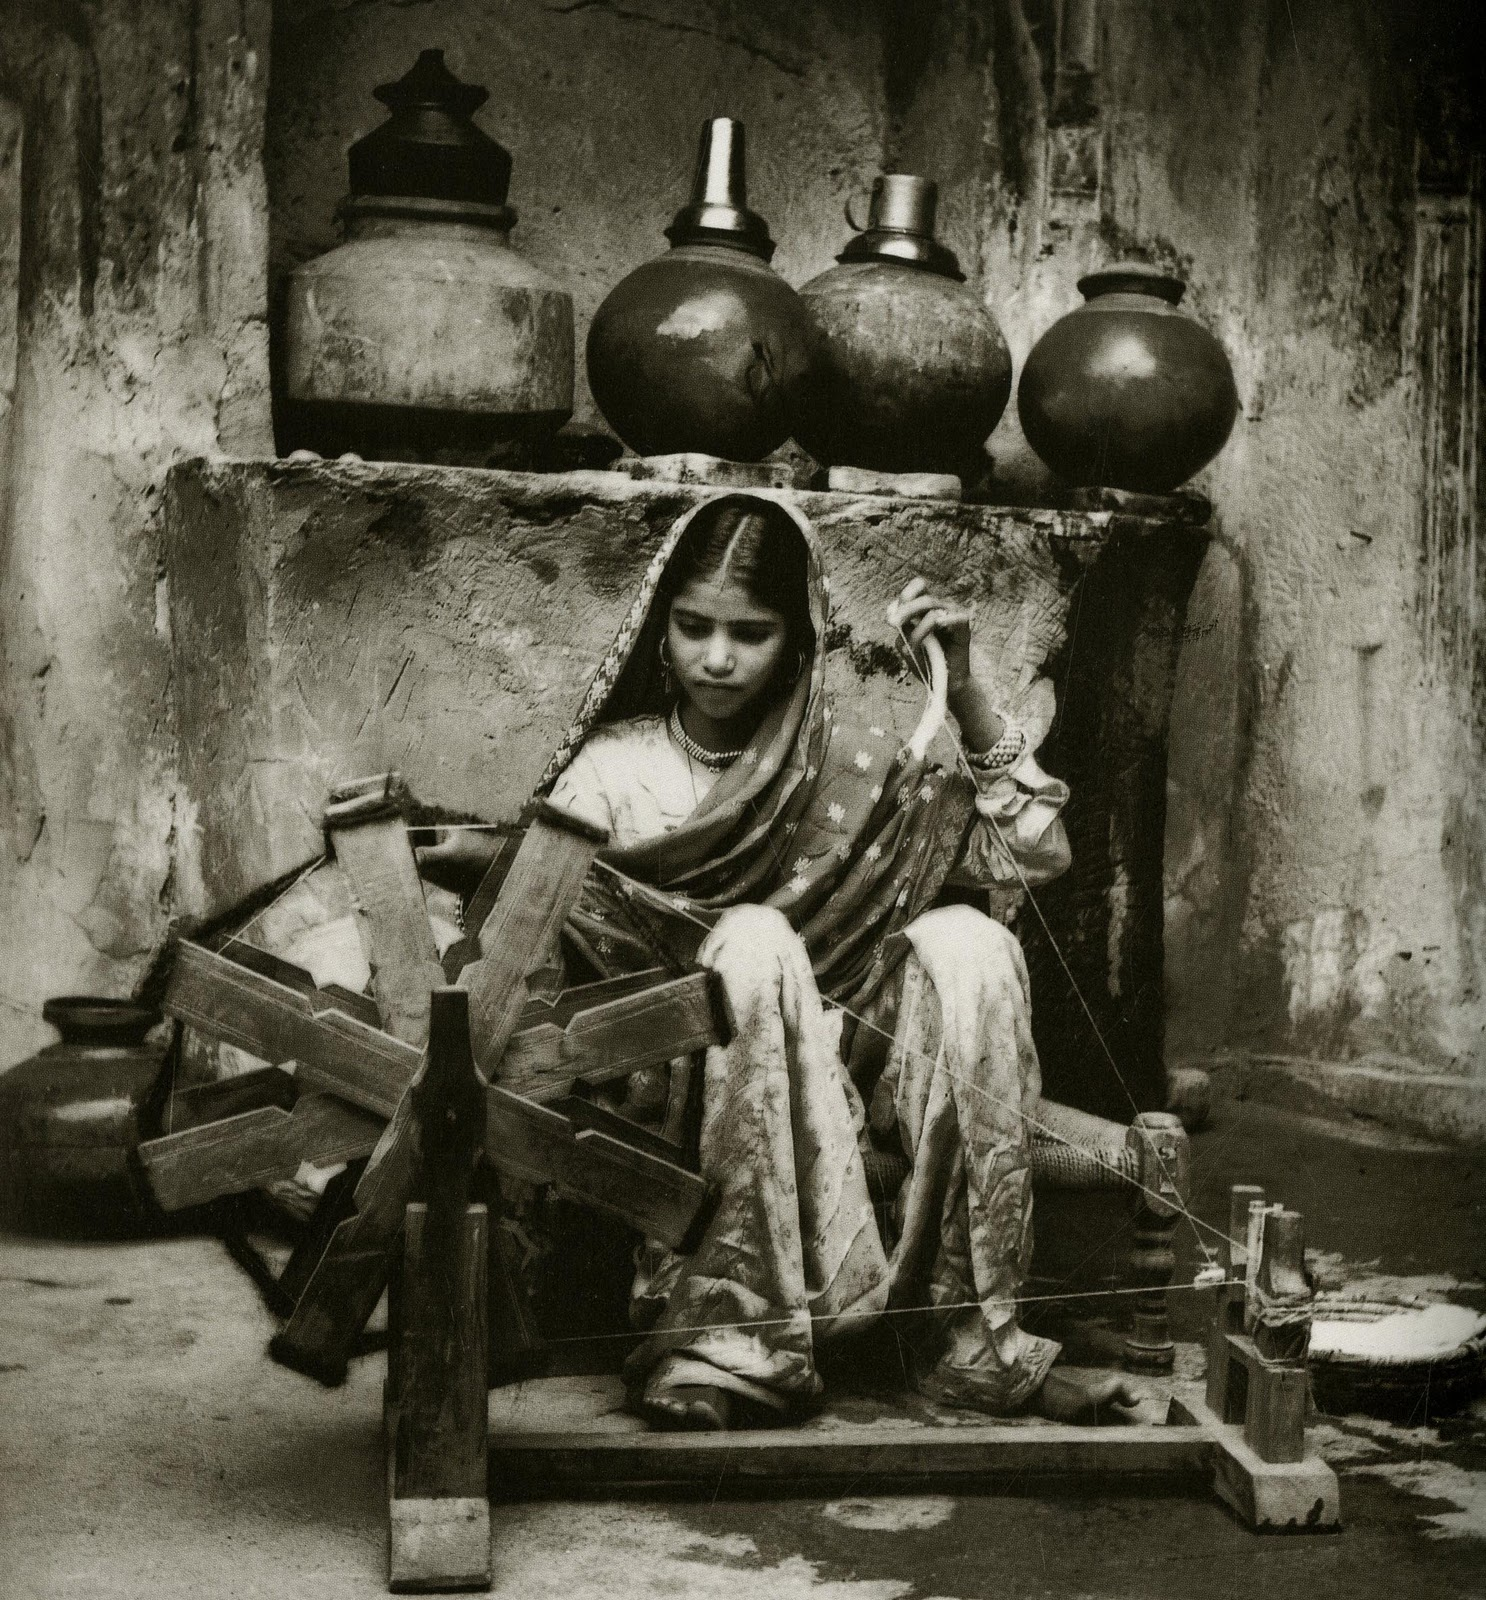 девушка за прялкой фотограф Abidmian Lalmian Syed